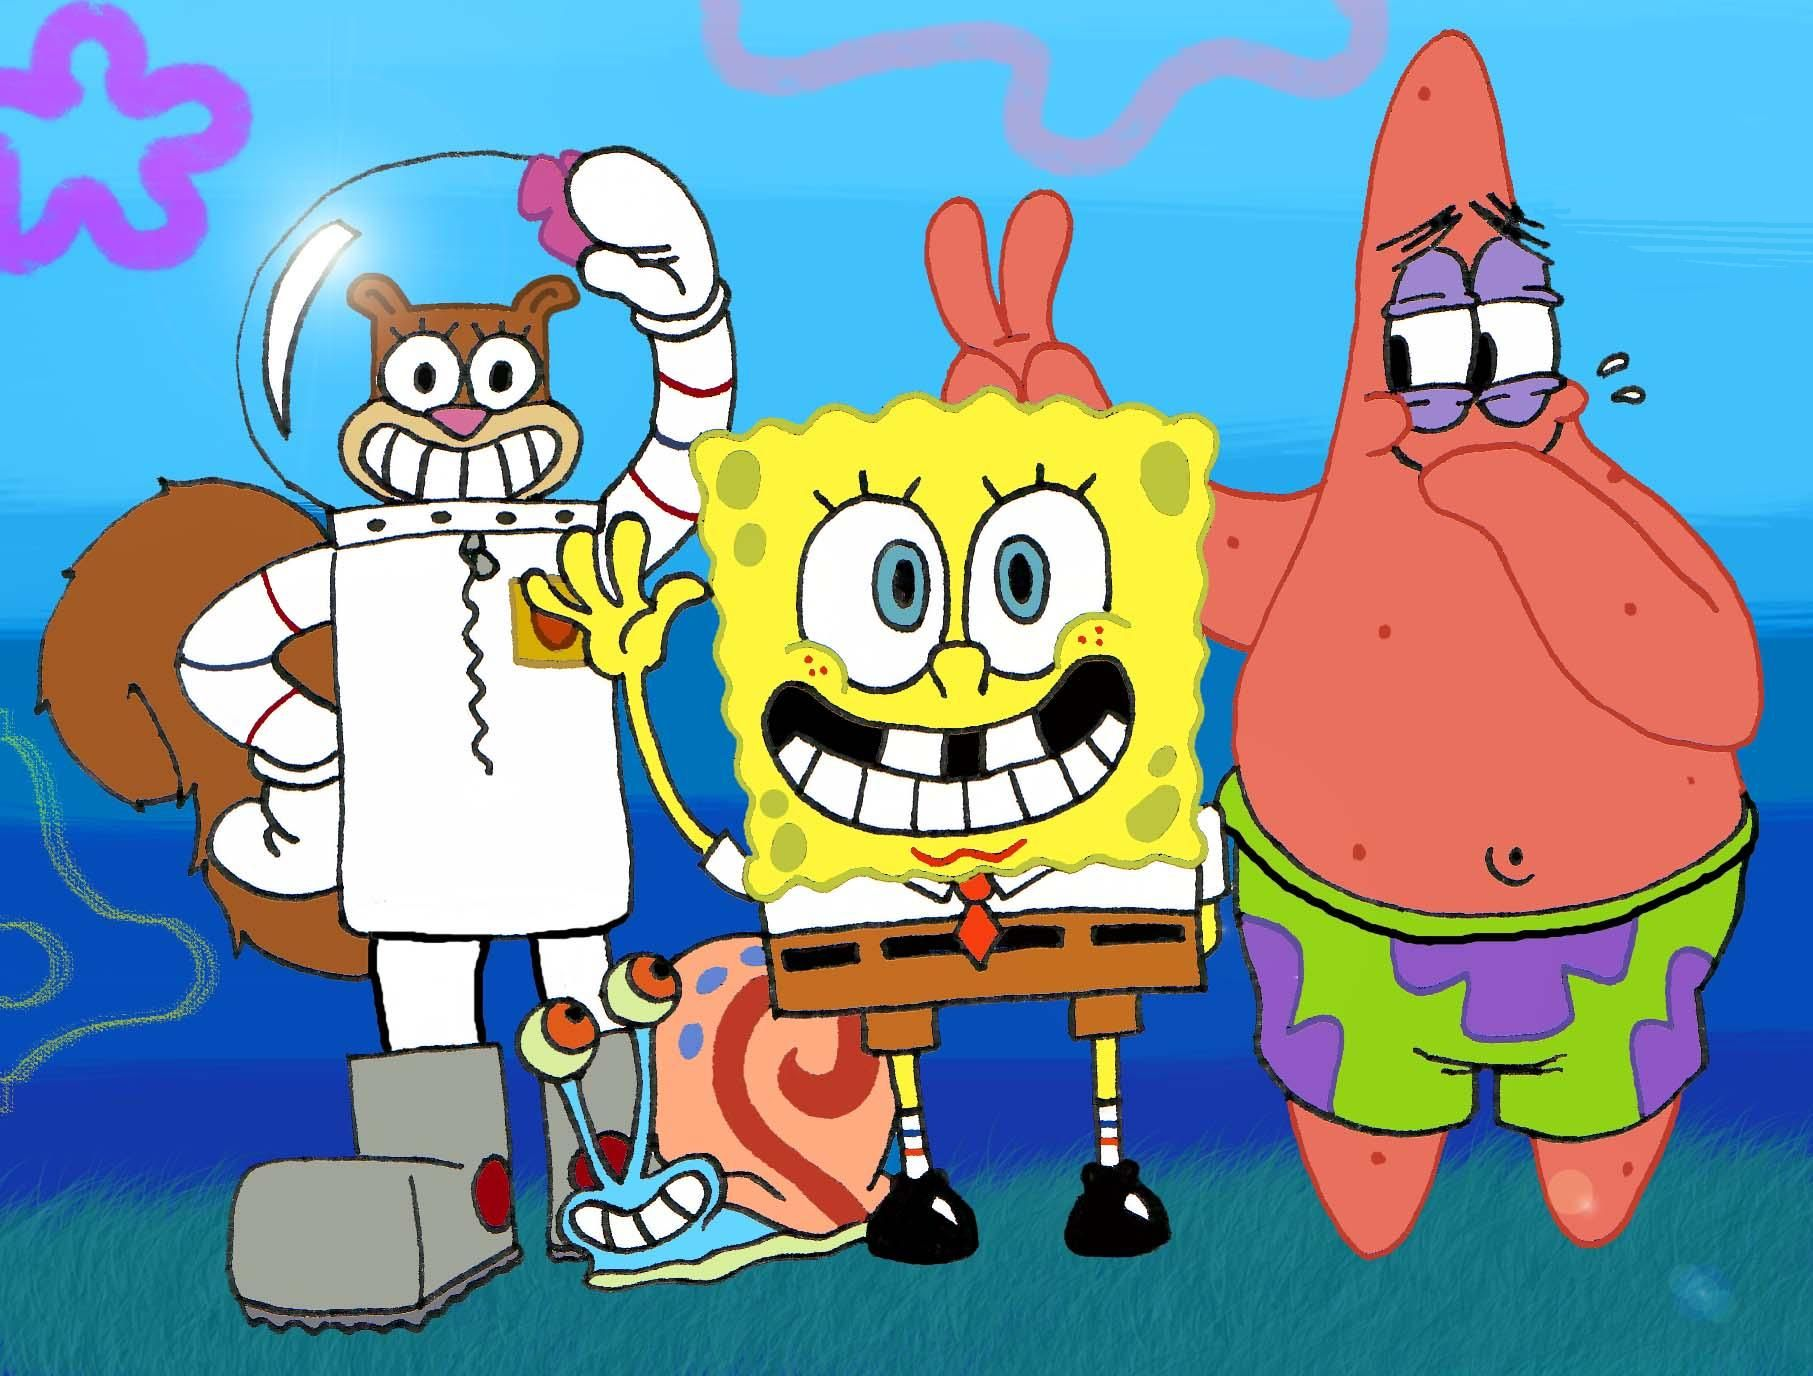 Spongebob Squarepants Wallpaper Images Background 66845 Ehiyo Com